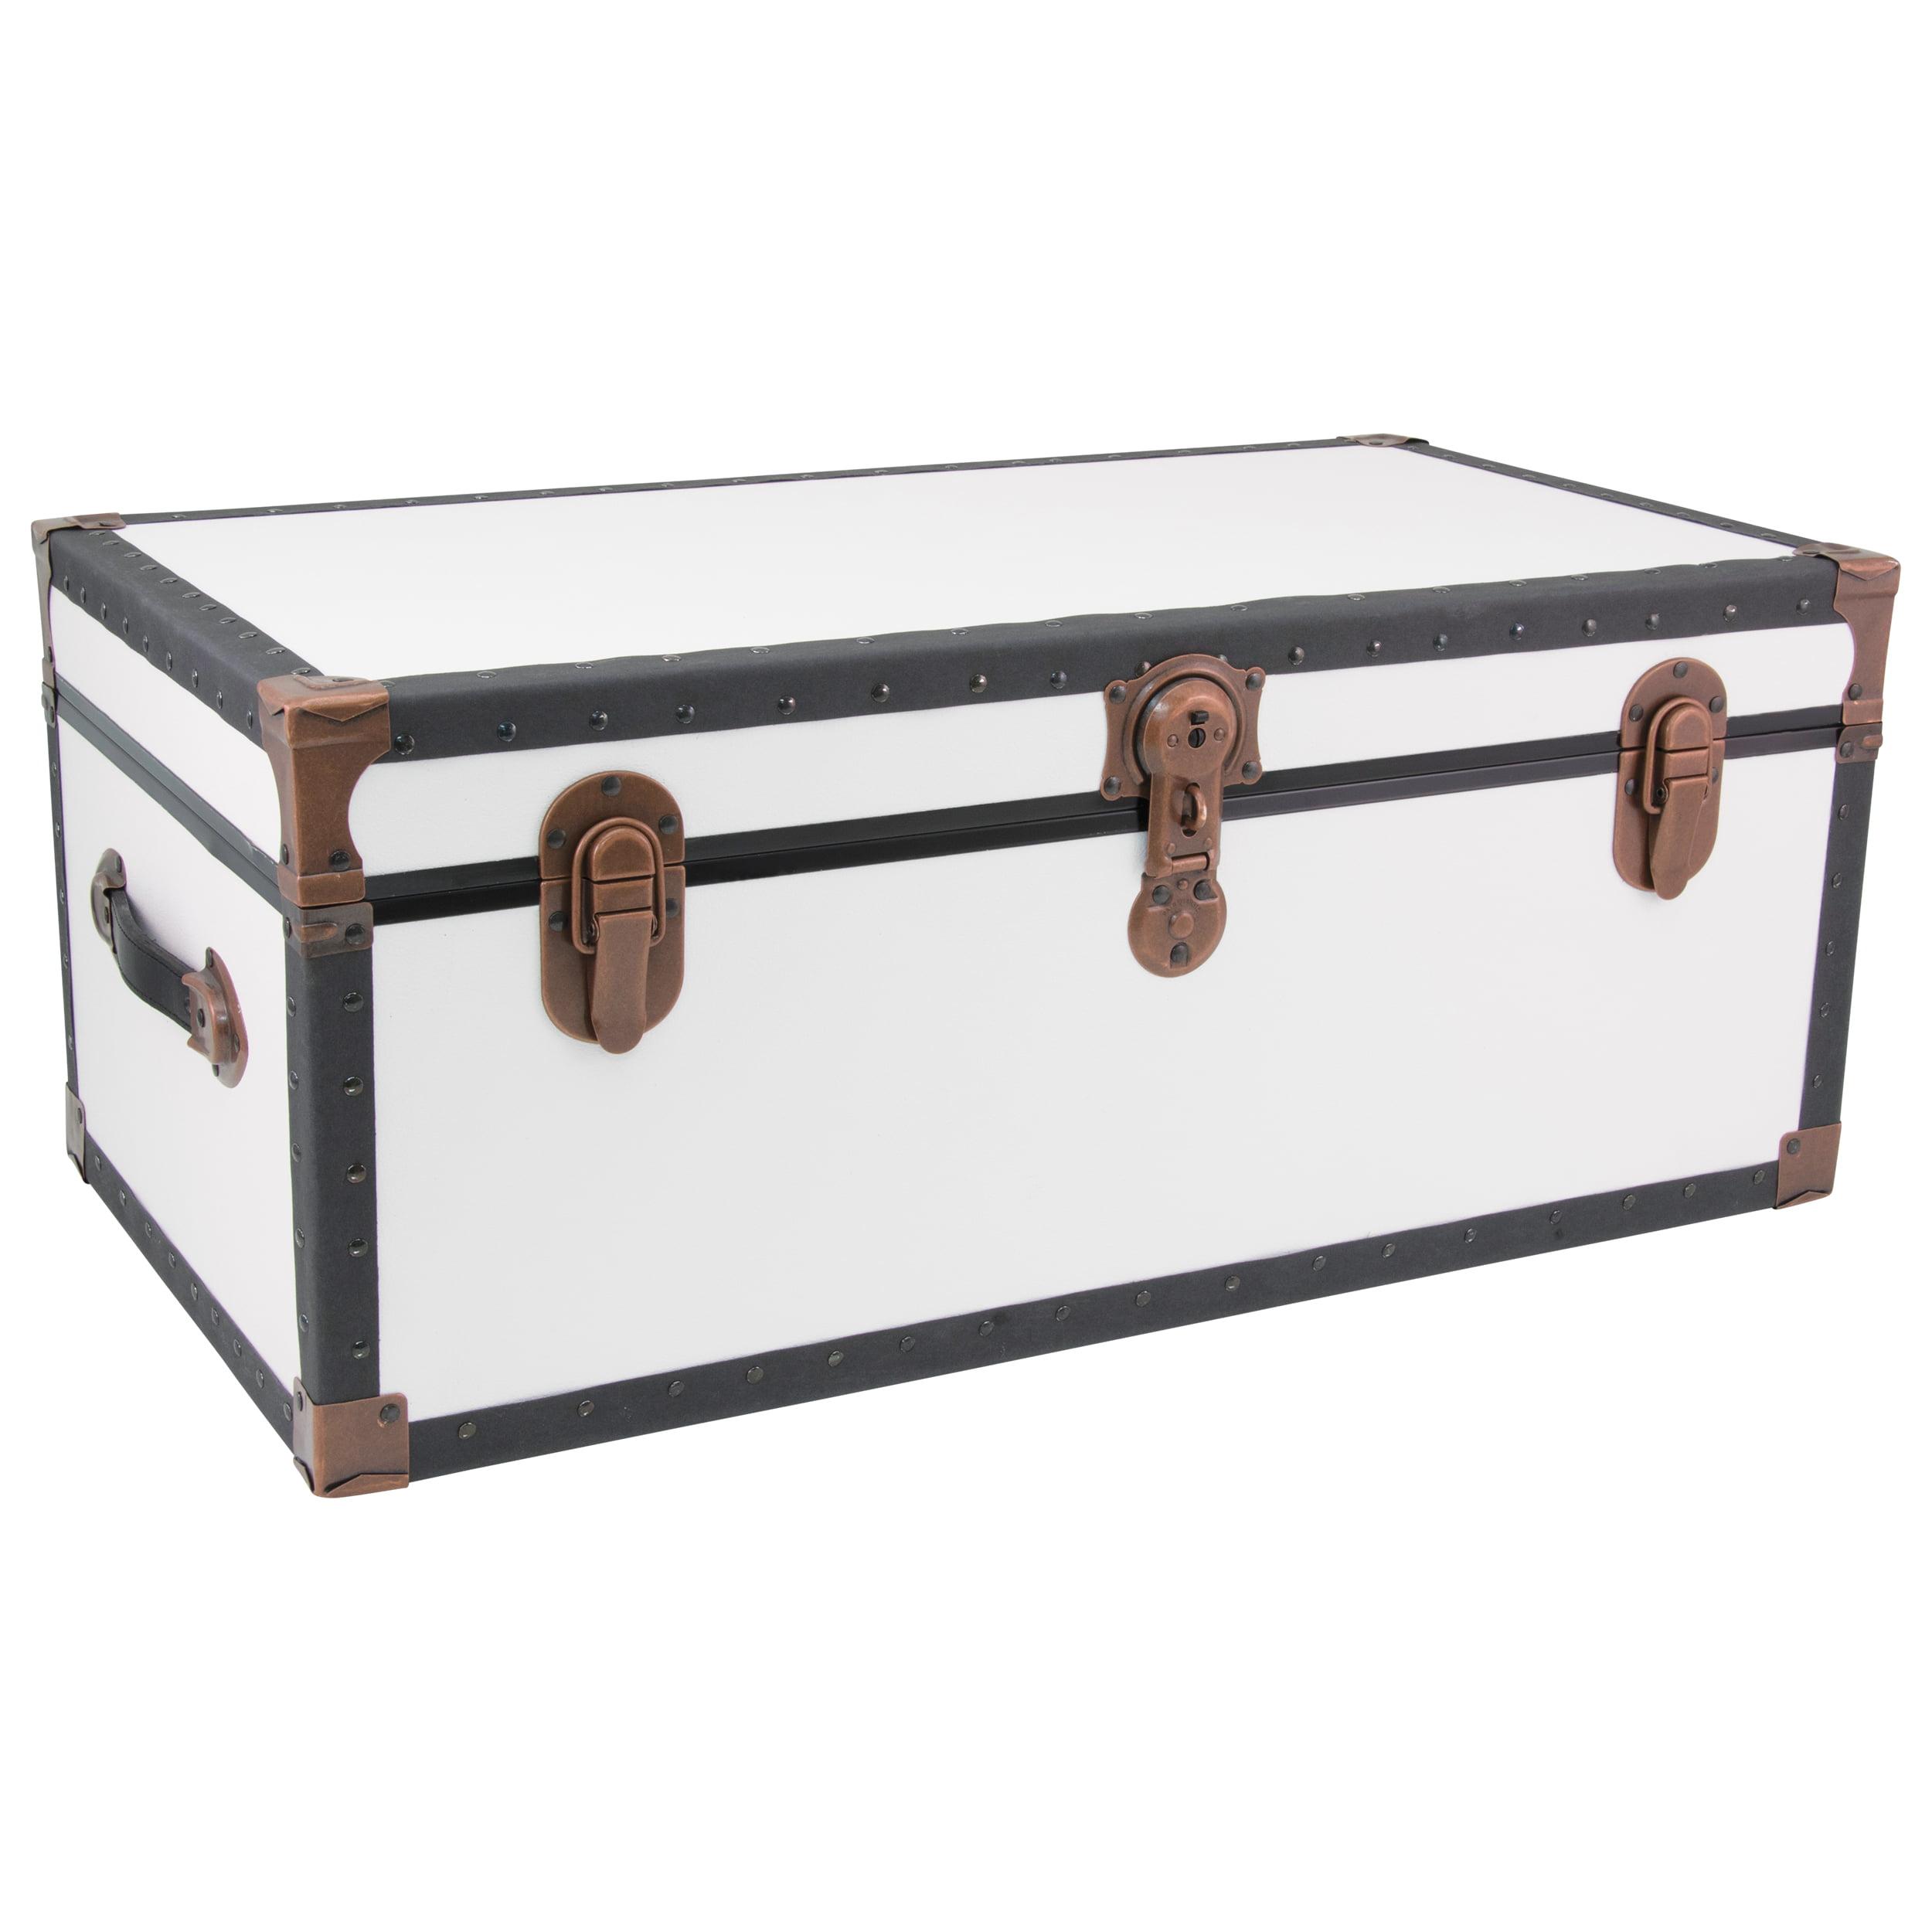 "Seward Trunk 31"" Over-Sized Locker, White with Copper Hardware"